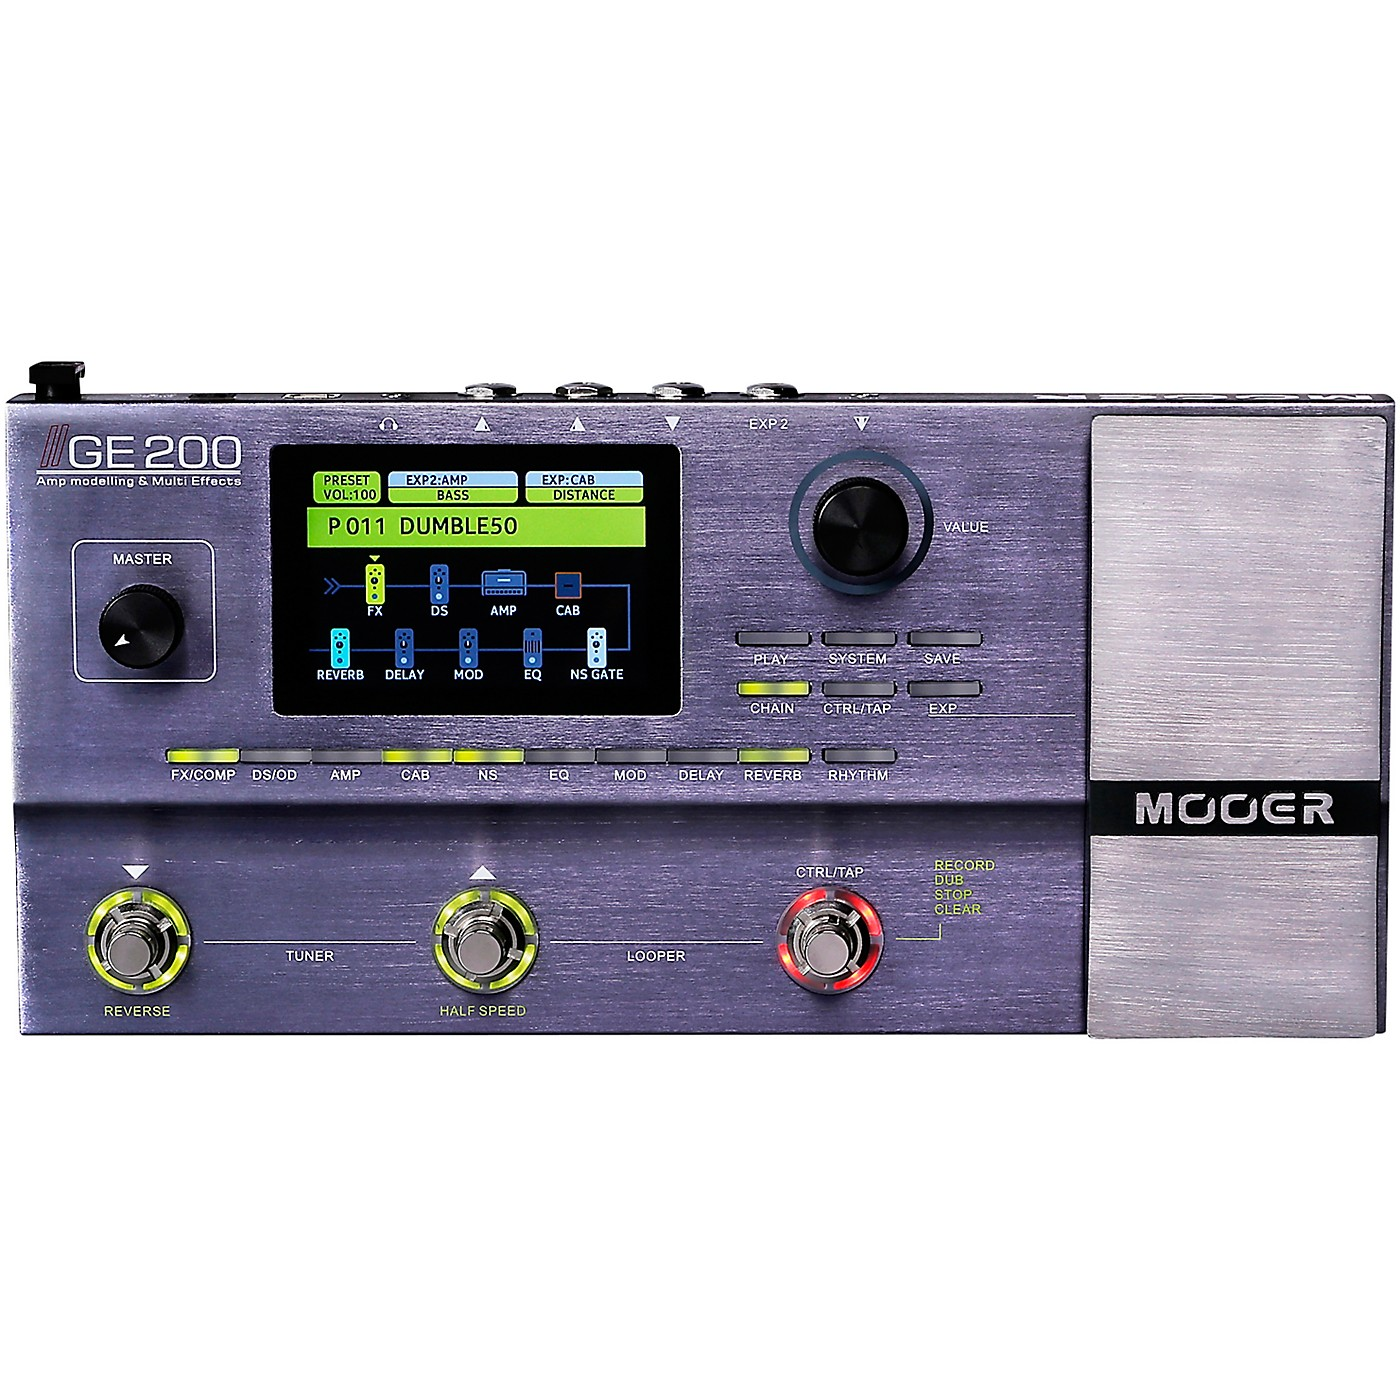 Mooer GE200 Multi-Effects Processor thumbnail